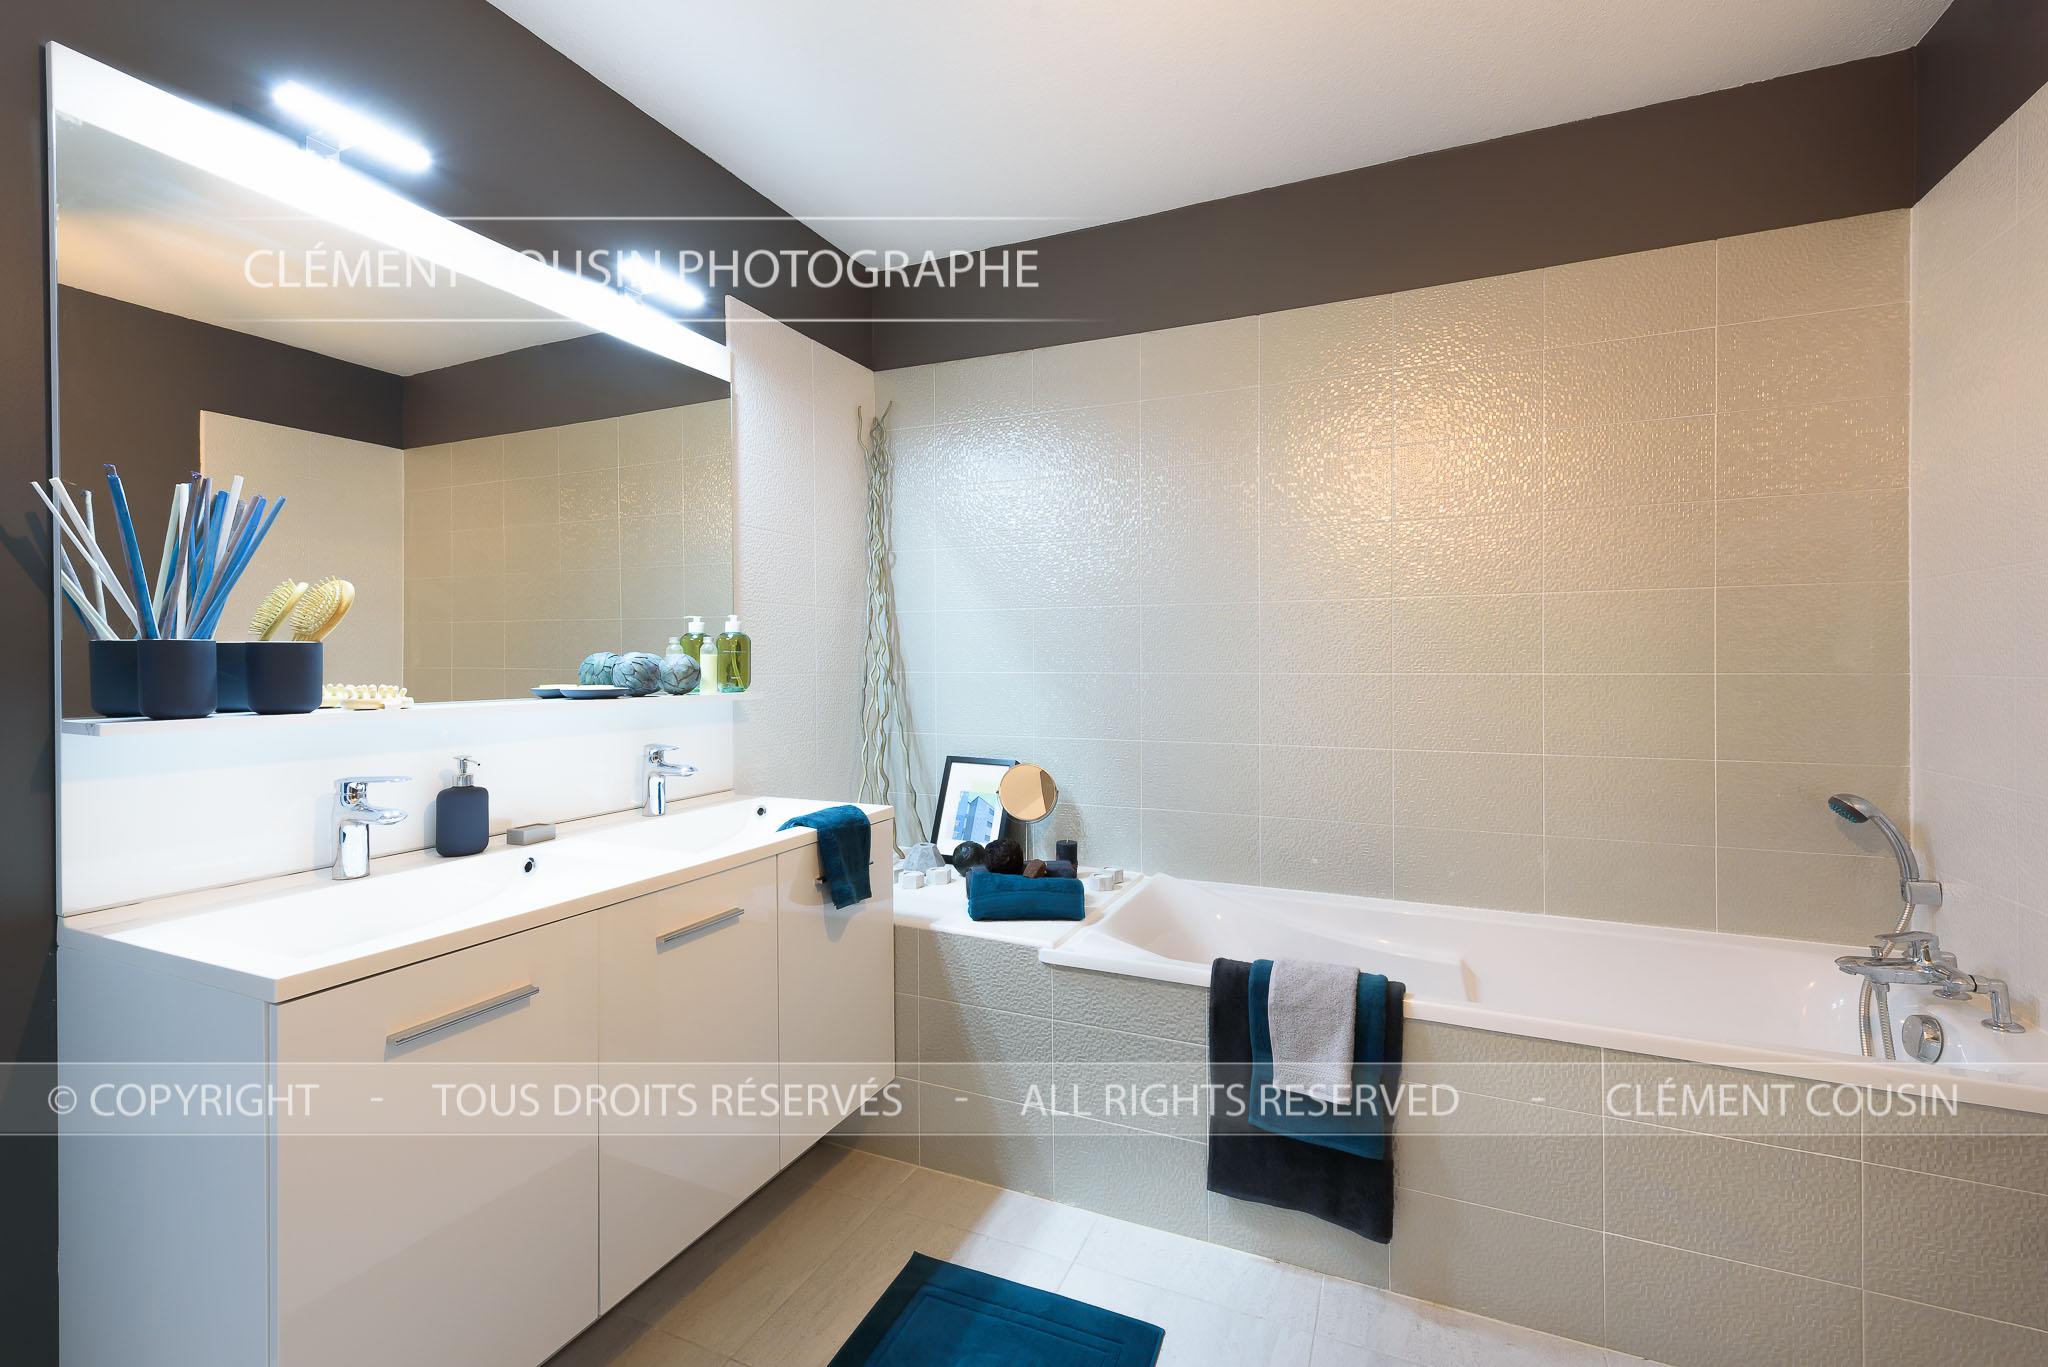 Appartement so park nexity 175 cc-3.jpg